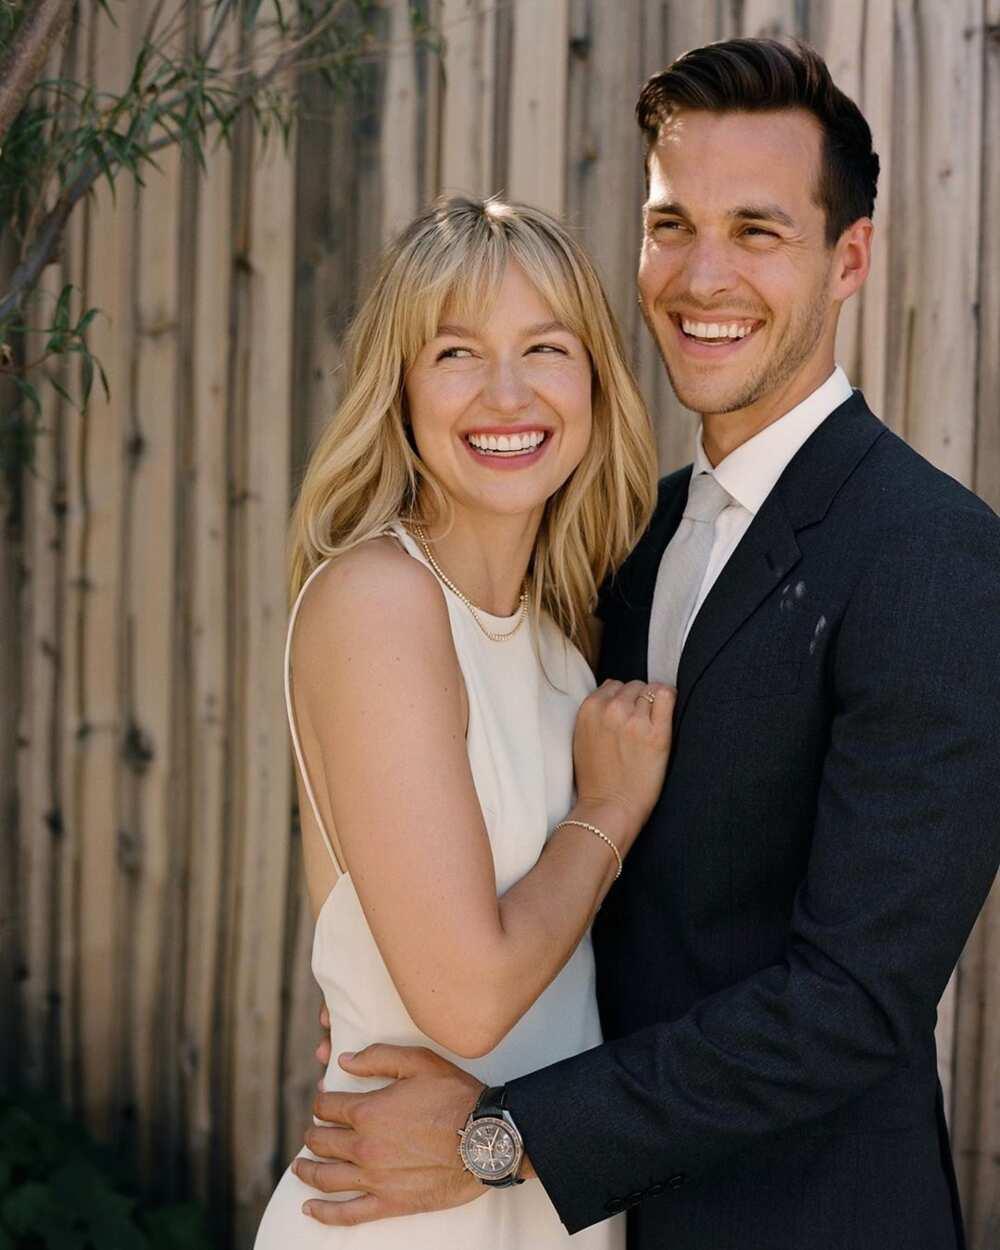 Chris Wood and Melissa Benoist